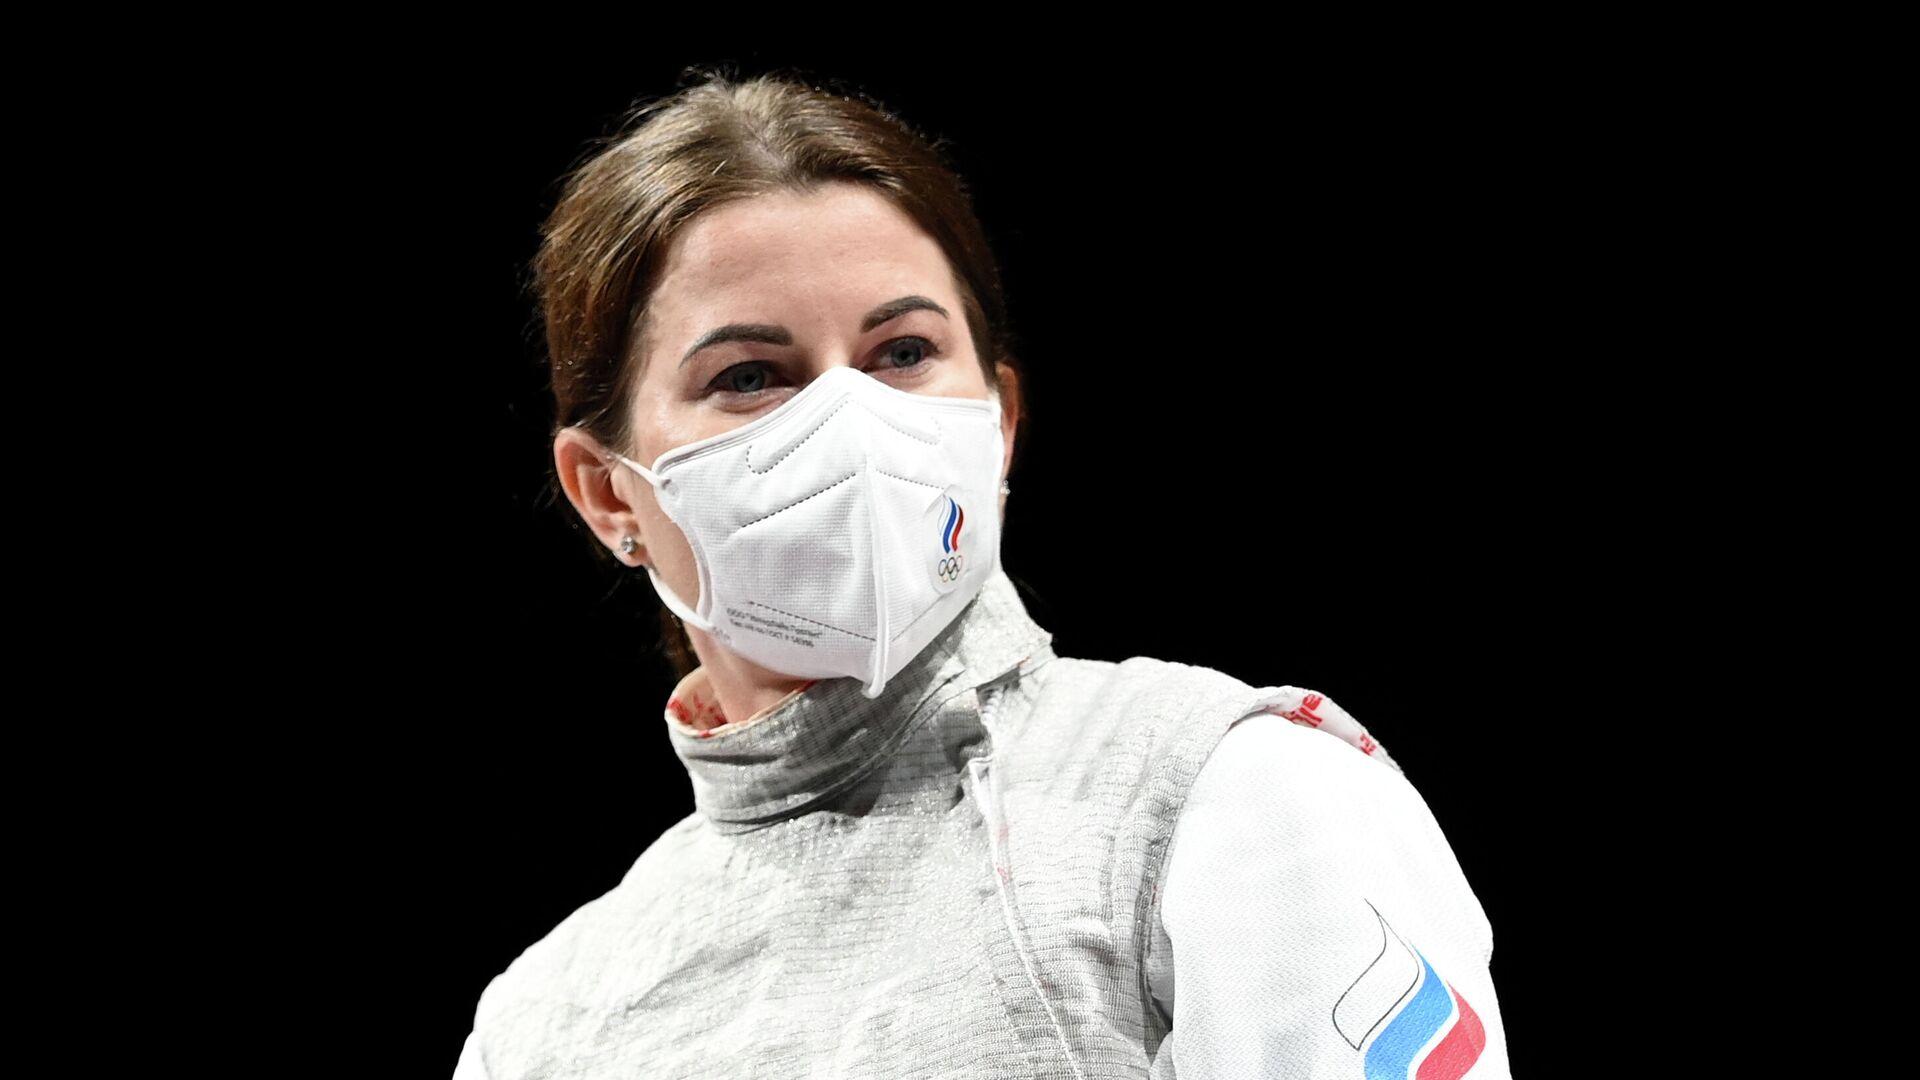 Олимпиада-2020. Фехтование. Женщины. Рапира - РИА Новости, 1920, 29.07.2021